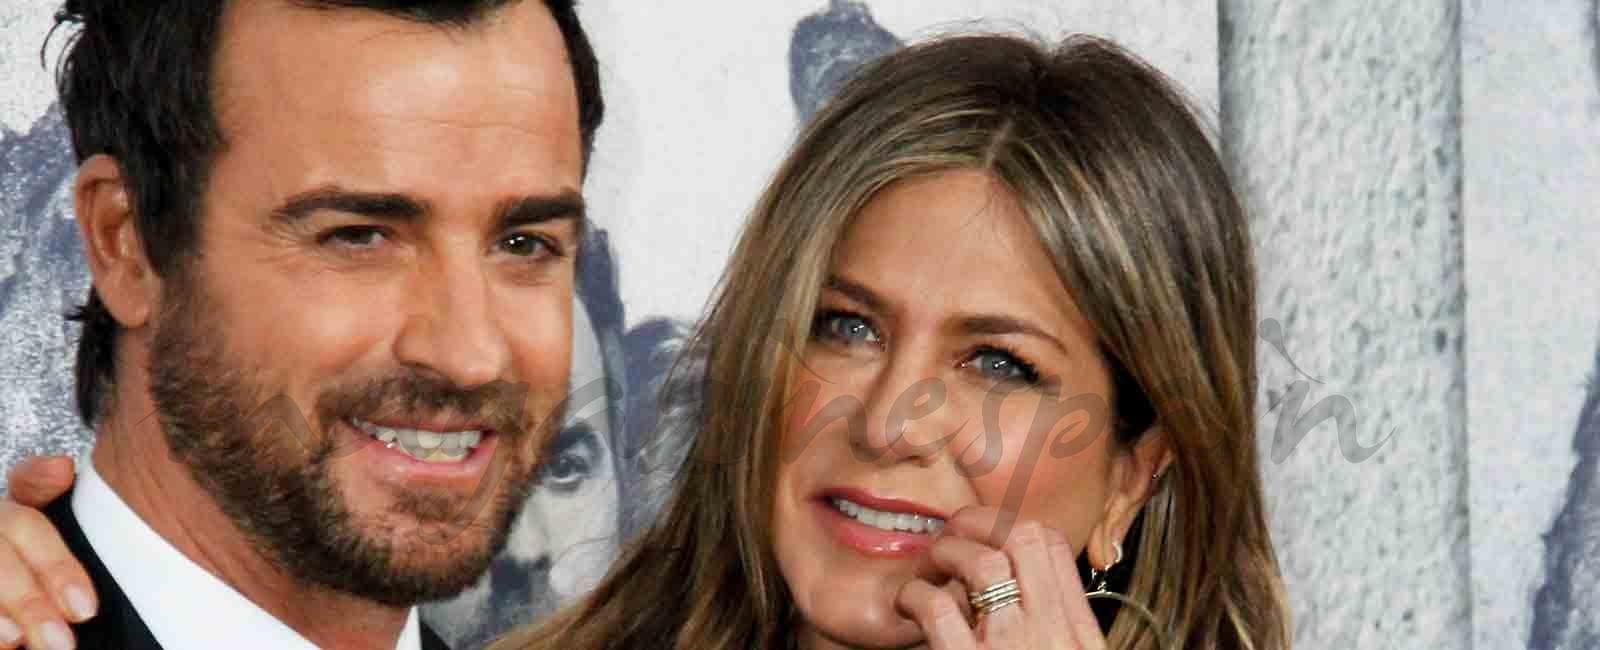 Jennifer Aniston, fan número uno de su marido, Justin Theroux